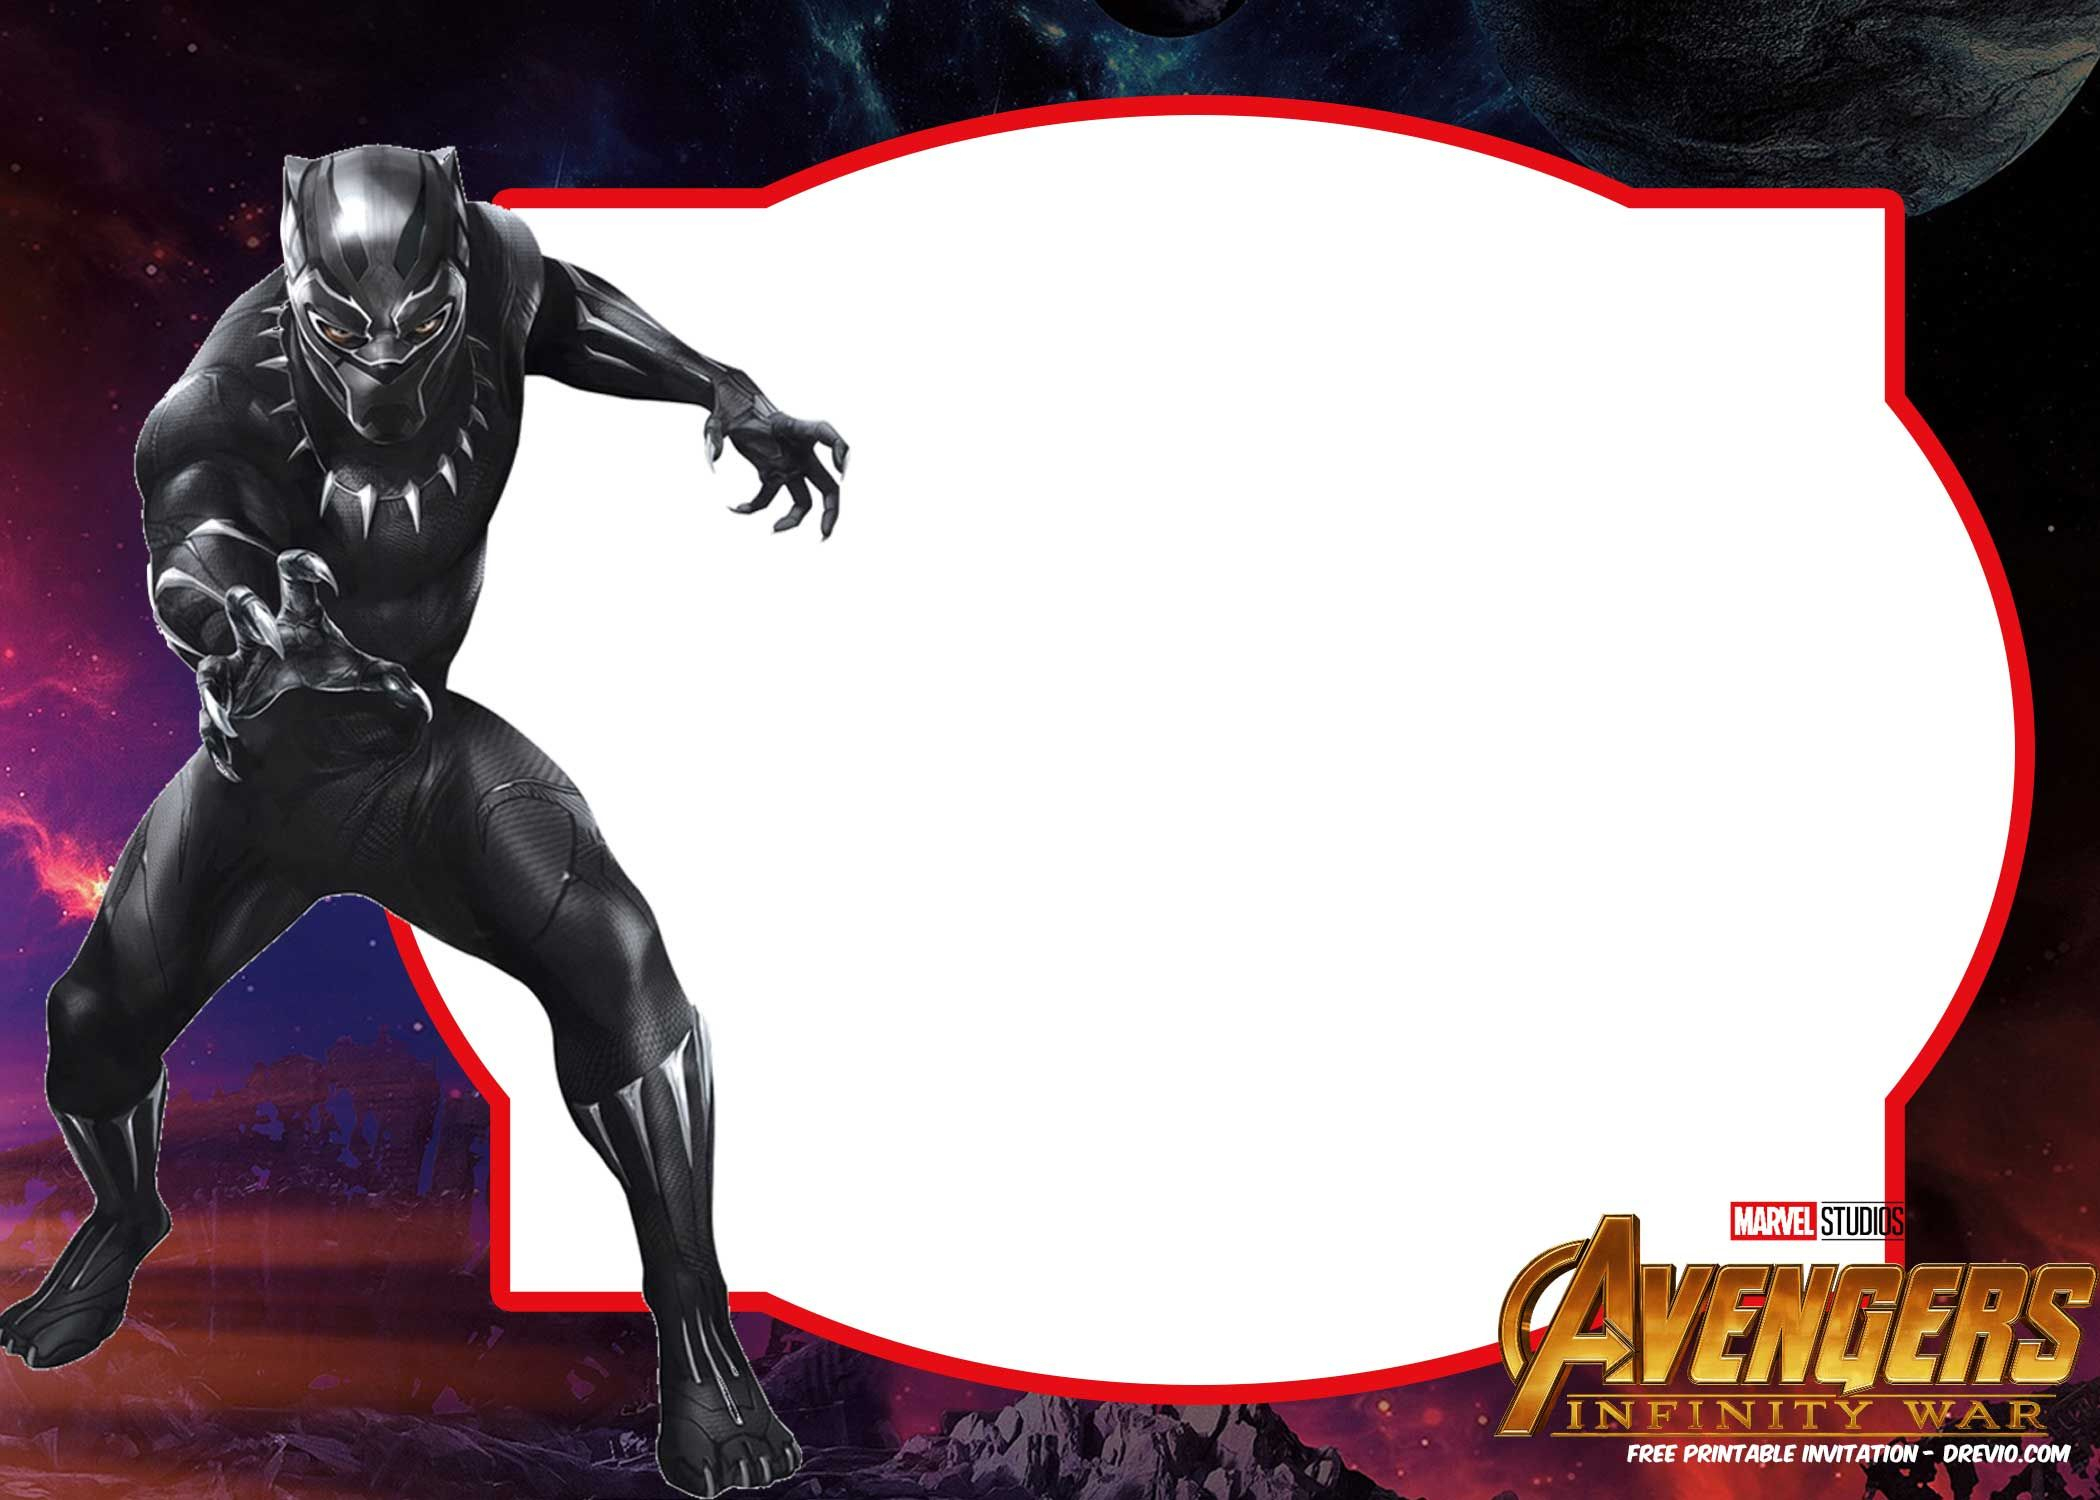 Free Avengers Infinity Wars Birthday Invitation Templates – All - Free Printable Avengers Birthday Party Invitations